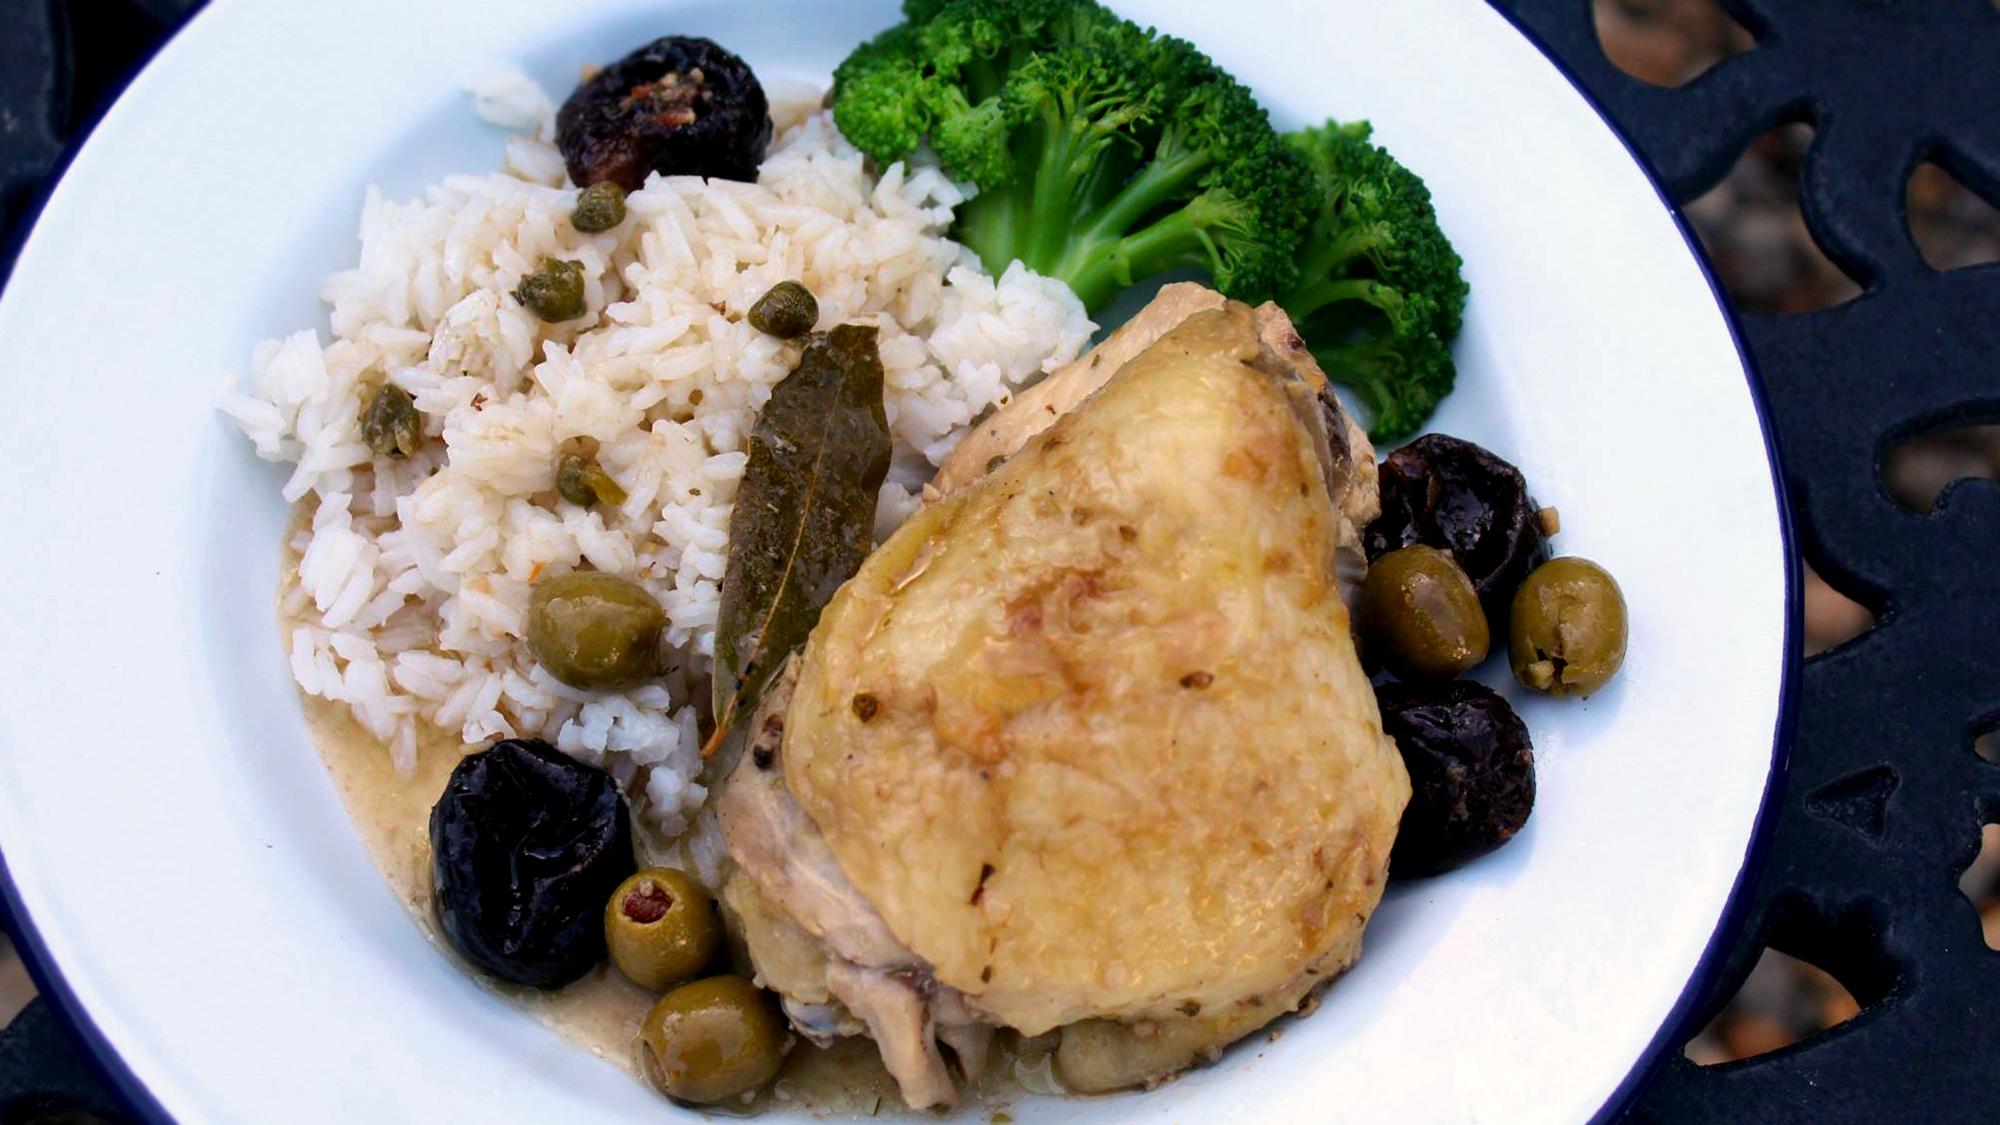 Nourishing Food. Expertly Made. -